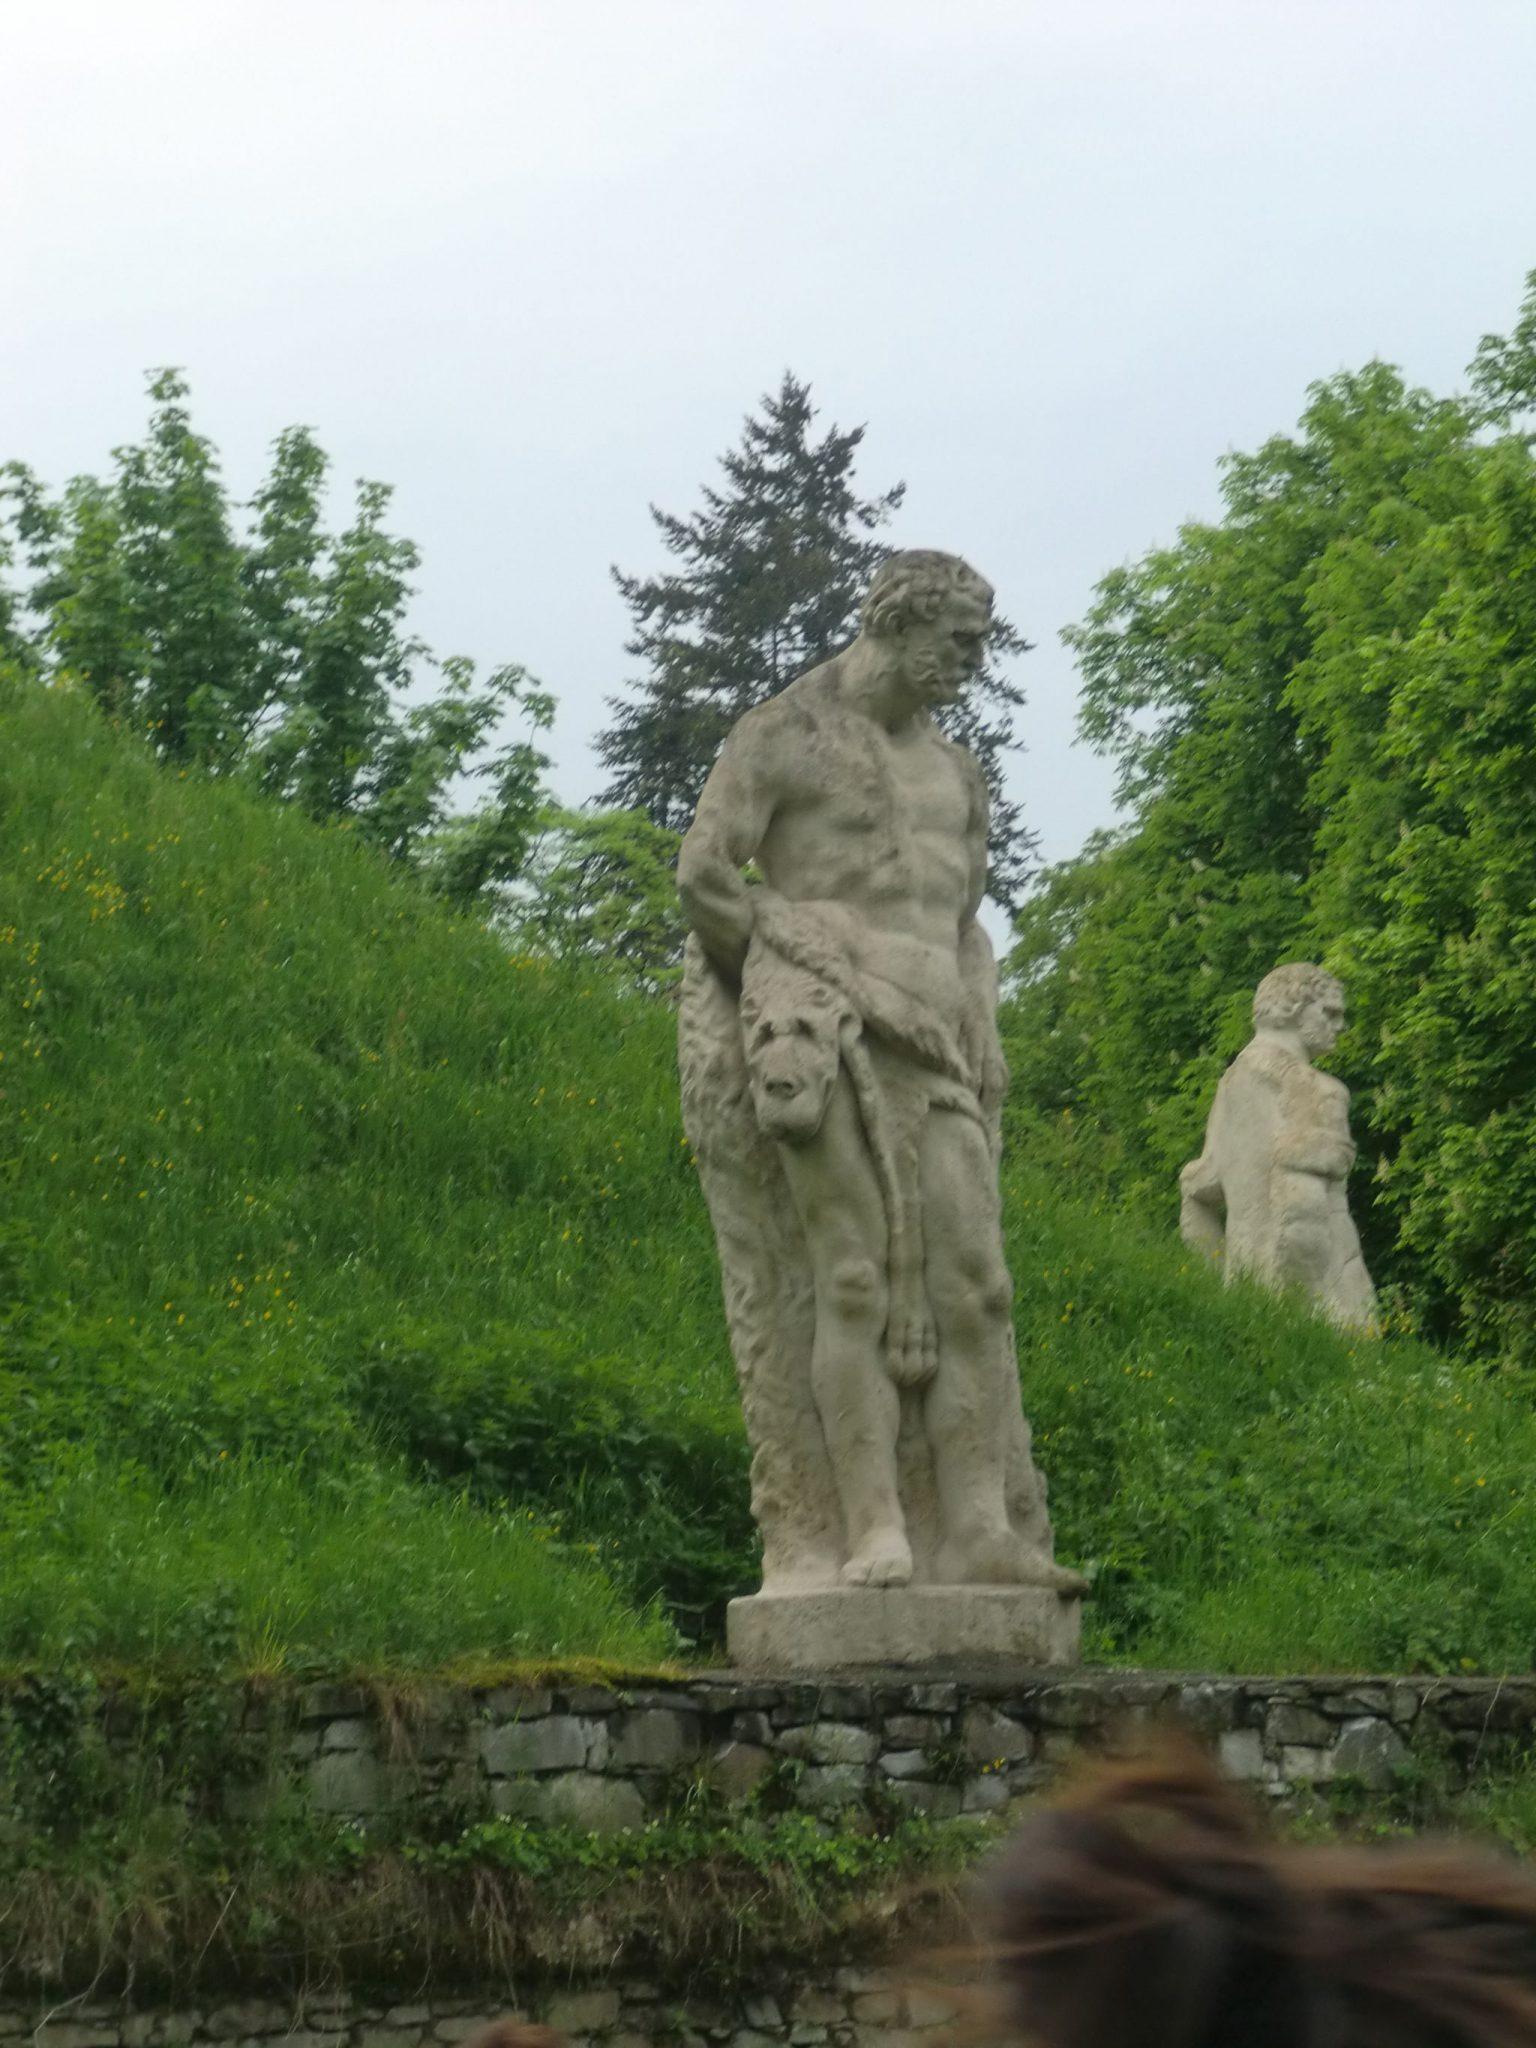 Graz park 6 - Graz: tradition and modernity